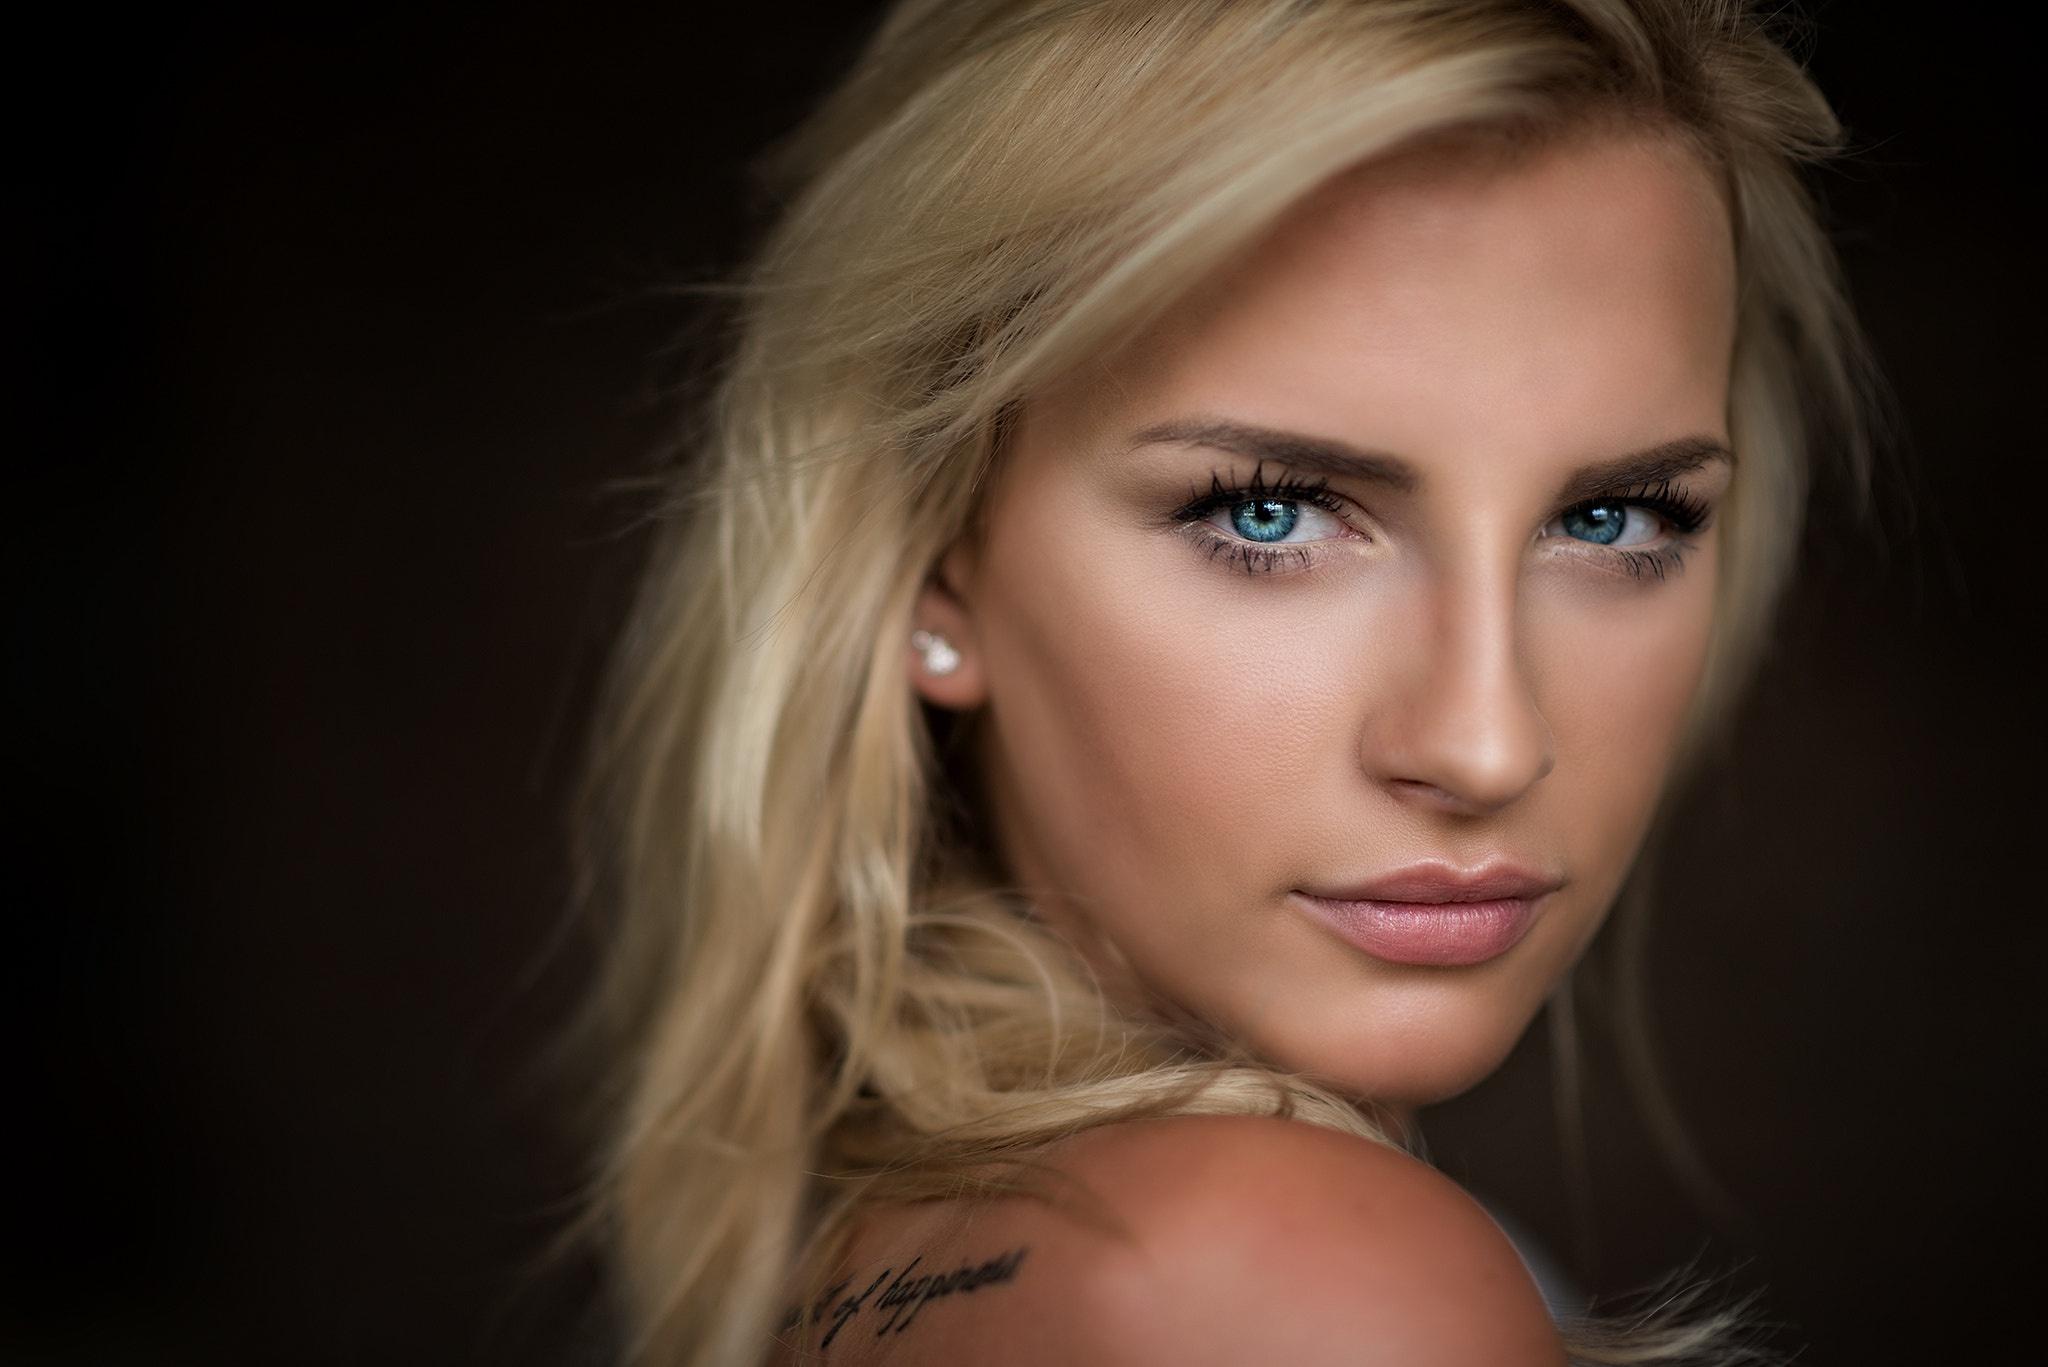 Wallpaper Face Model Blonde Long Hair Blue Eyes: Download Wallpaper Girl, Model, Long Hair, Photo, Blue